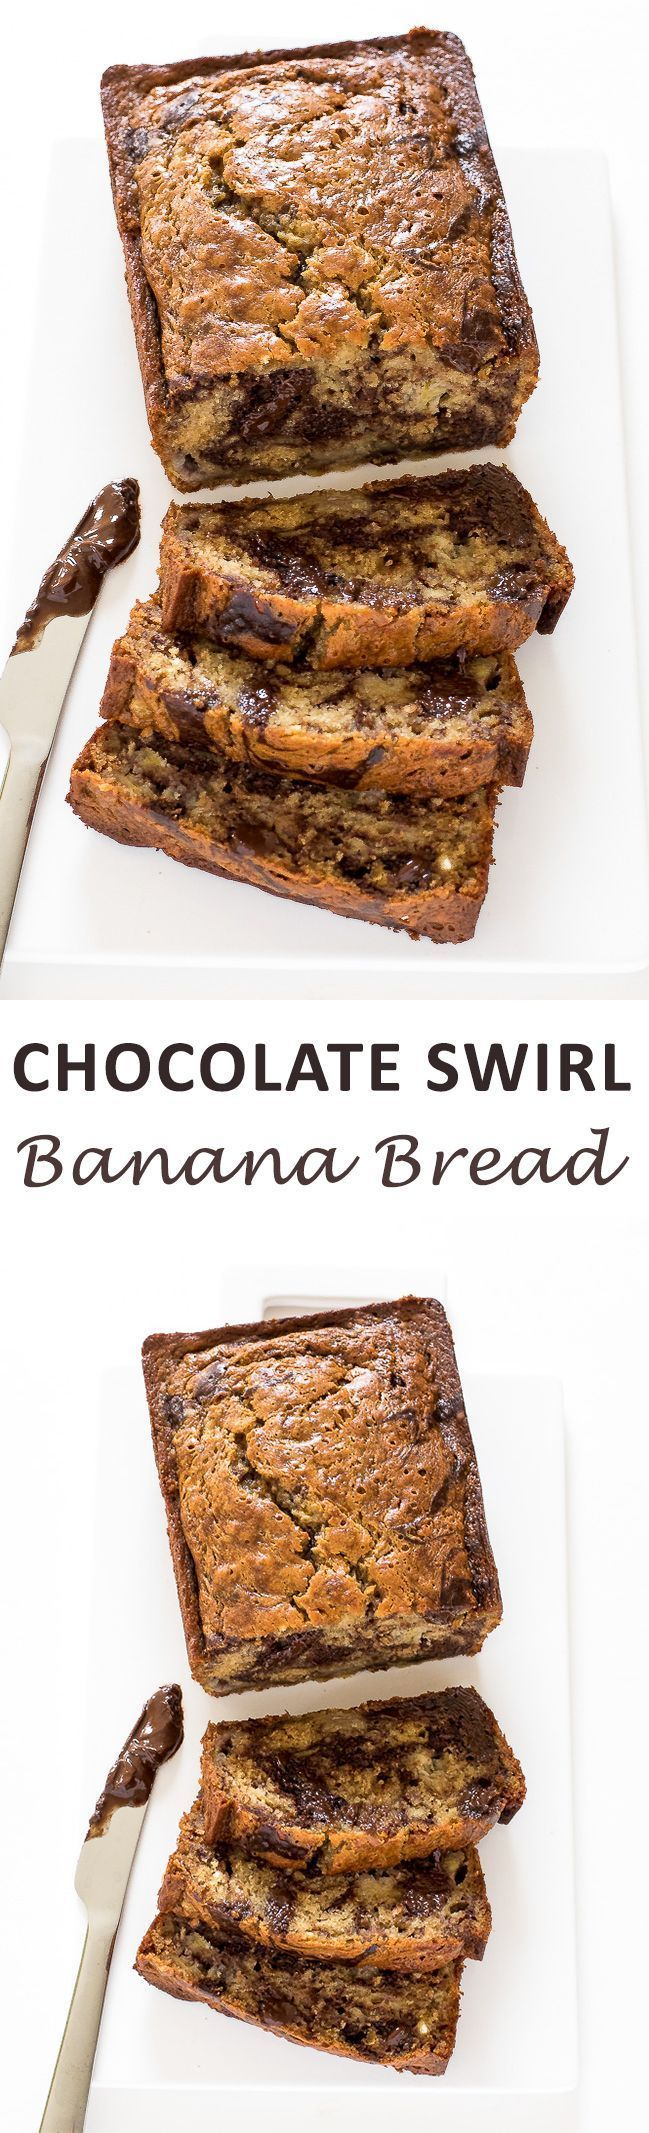 Marbled Chocolate Banana Bread. Super moist banana bread swirled with chocolate, yum!